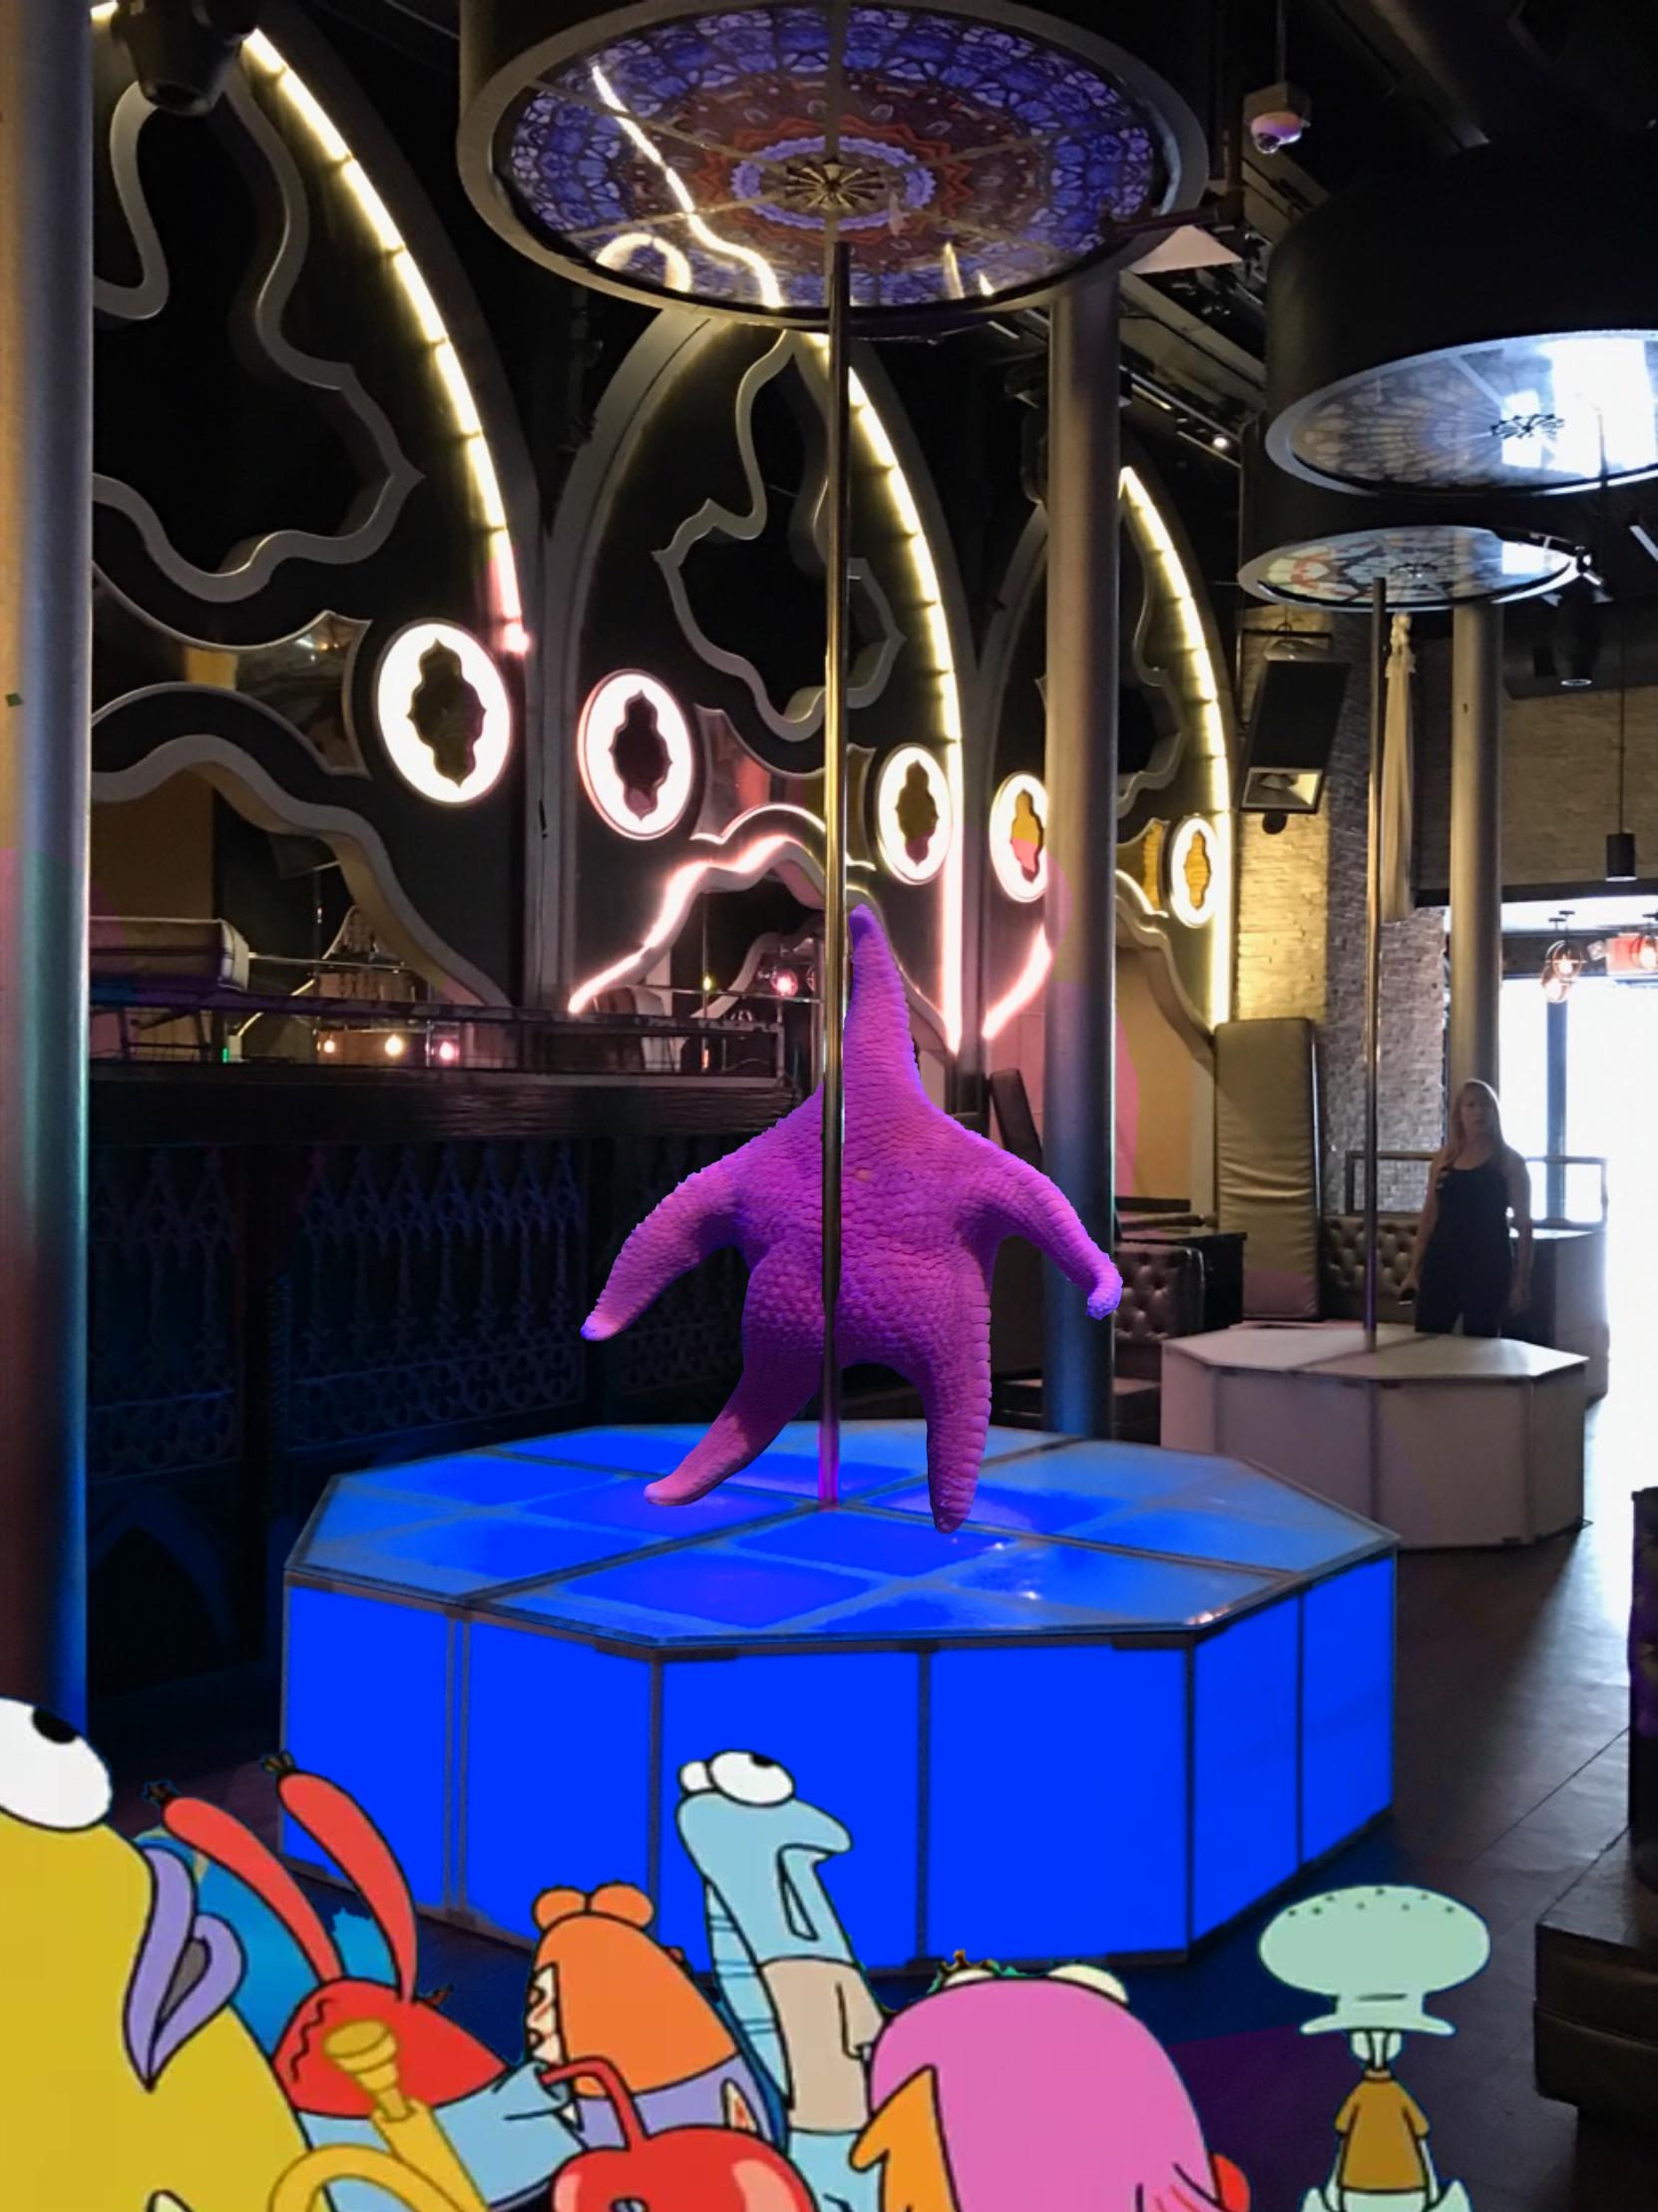 Thicc Starfish meme - pole dancing Patrick